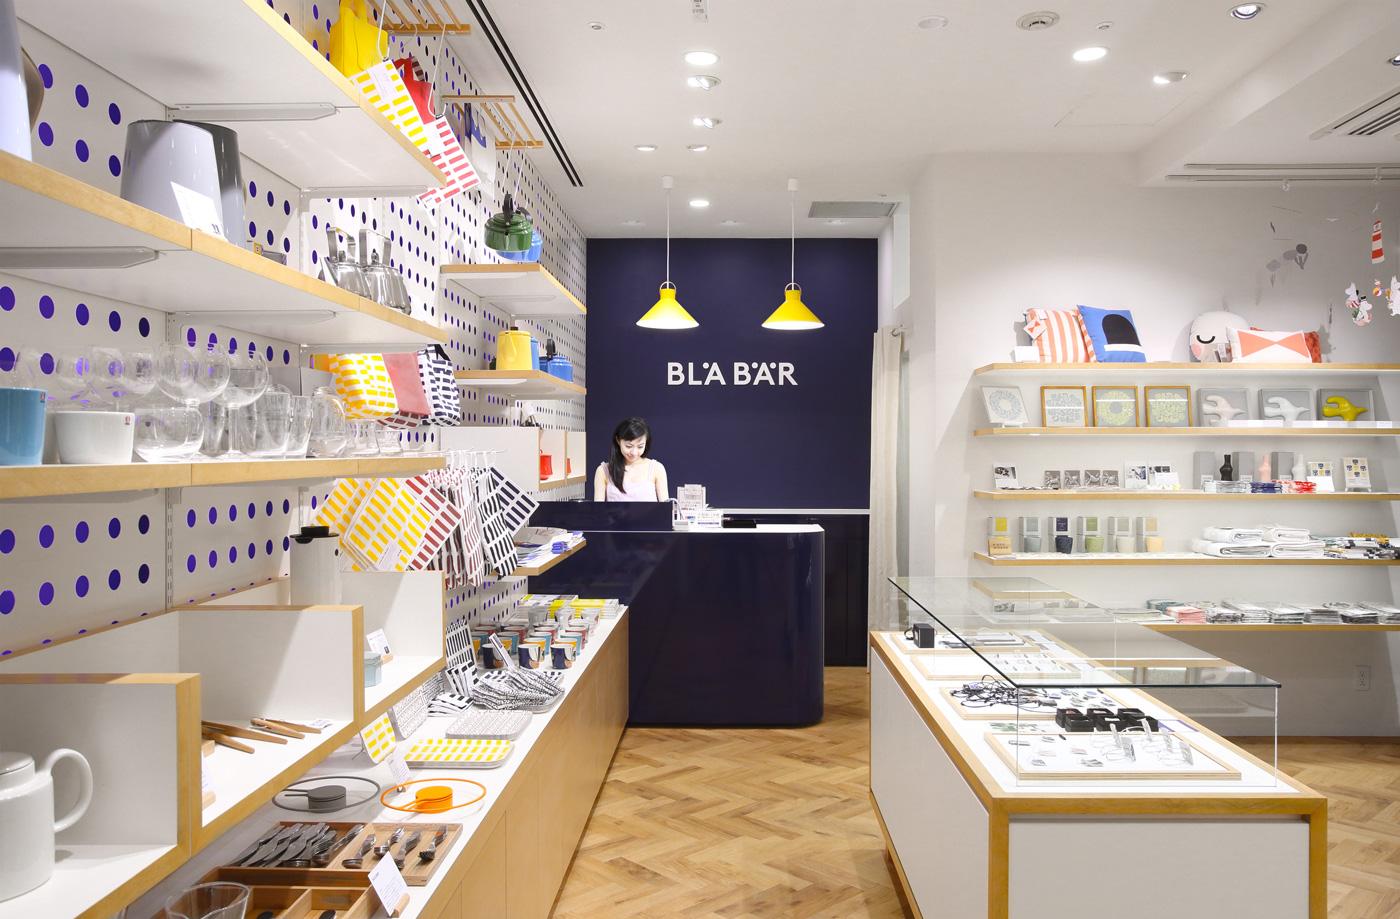 Logotype and interior graphics by Swedish studio BVD for Blå Bär, an Osaka-based retailer of Scandinavian goods